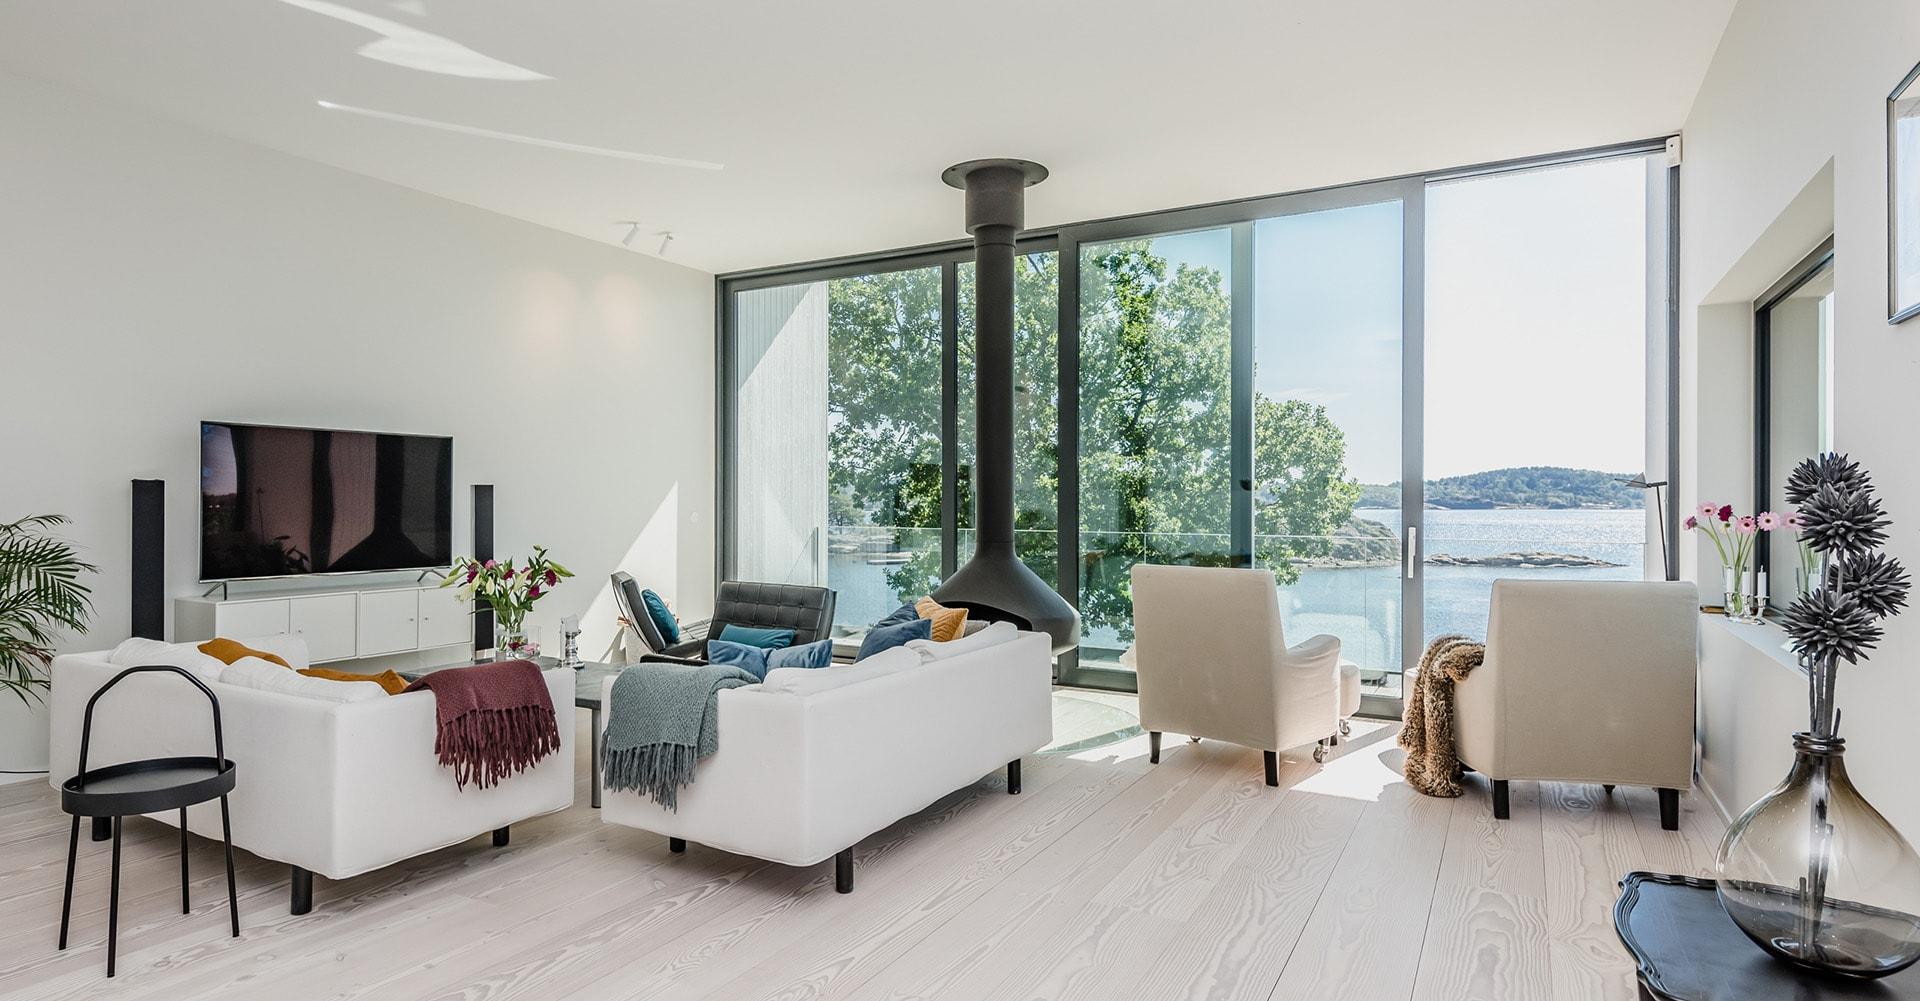 Driv Arkitekter, Sandefjord, Båtstangveien 84B